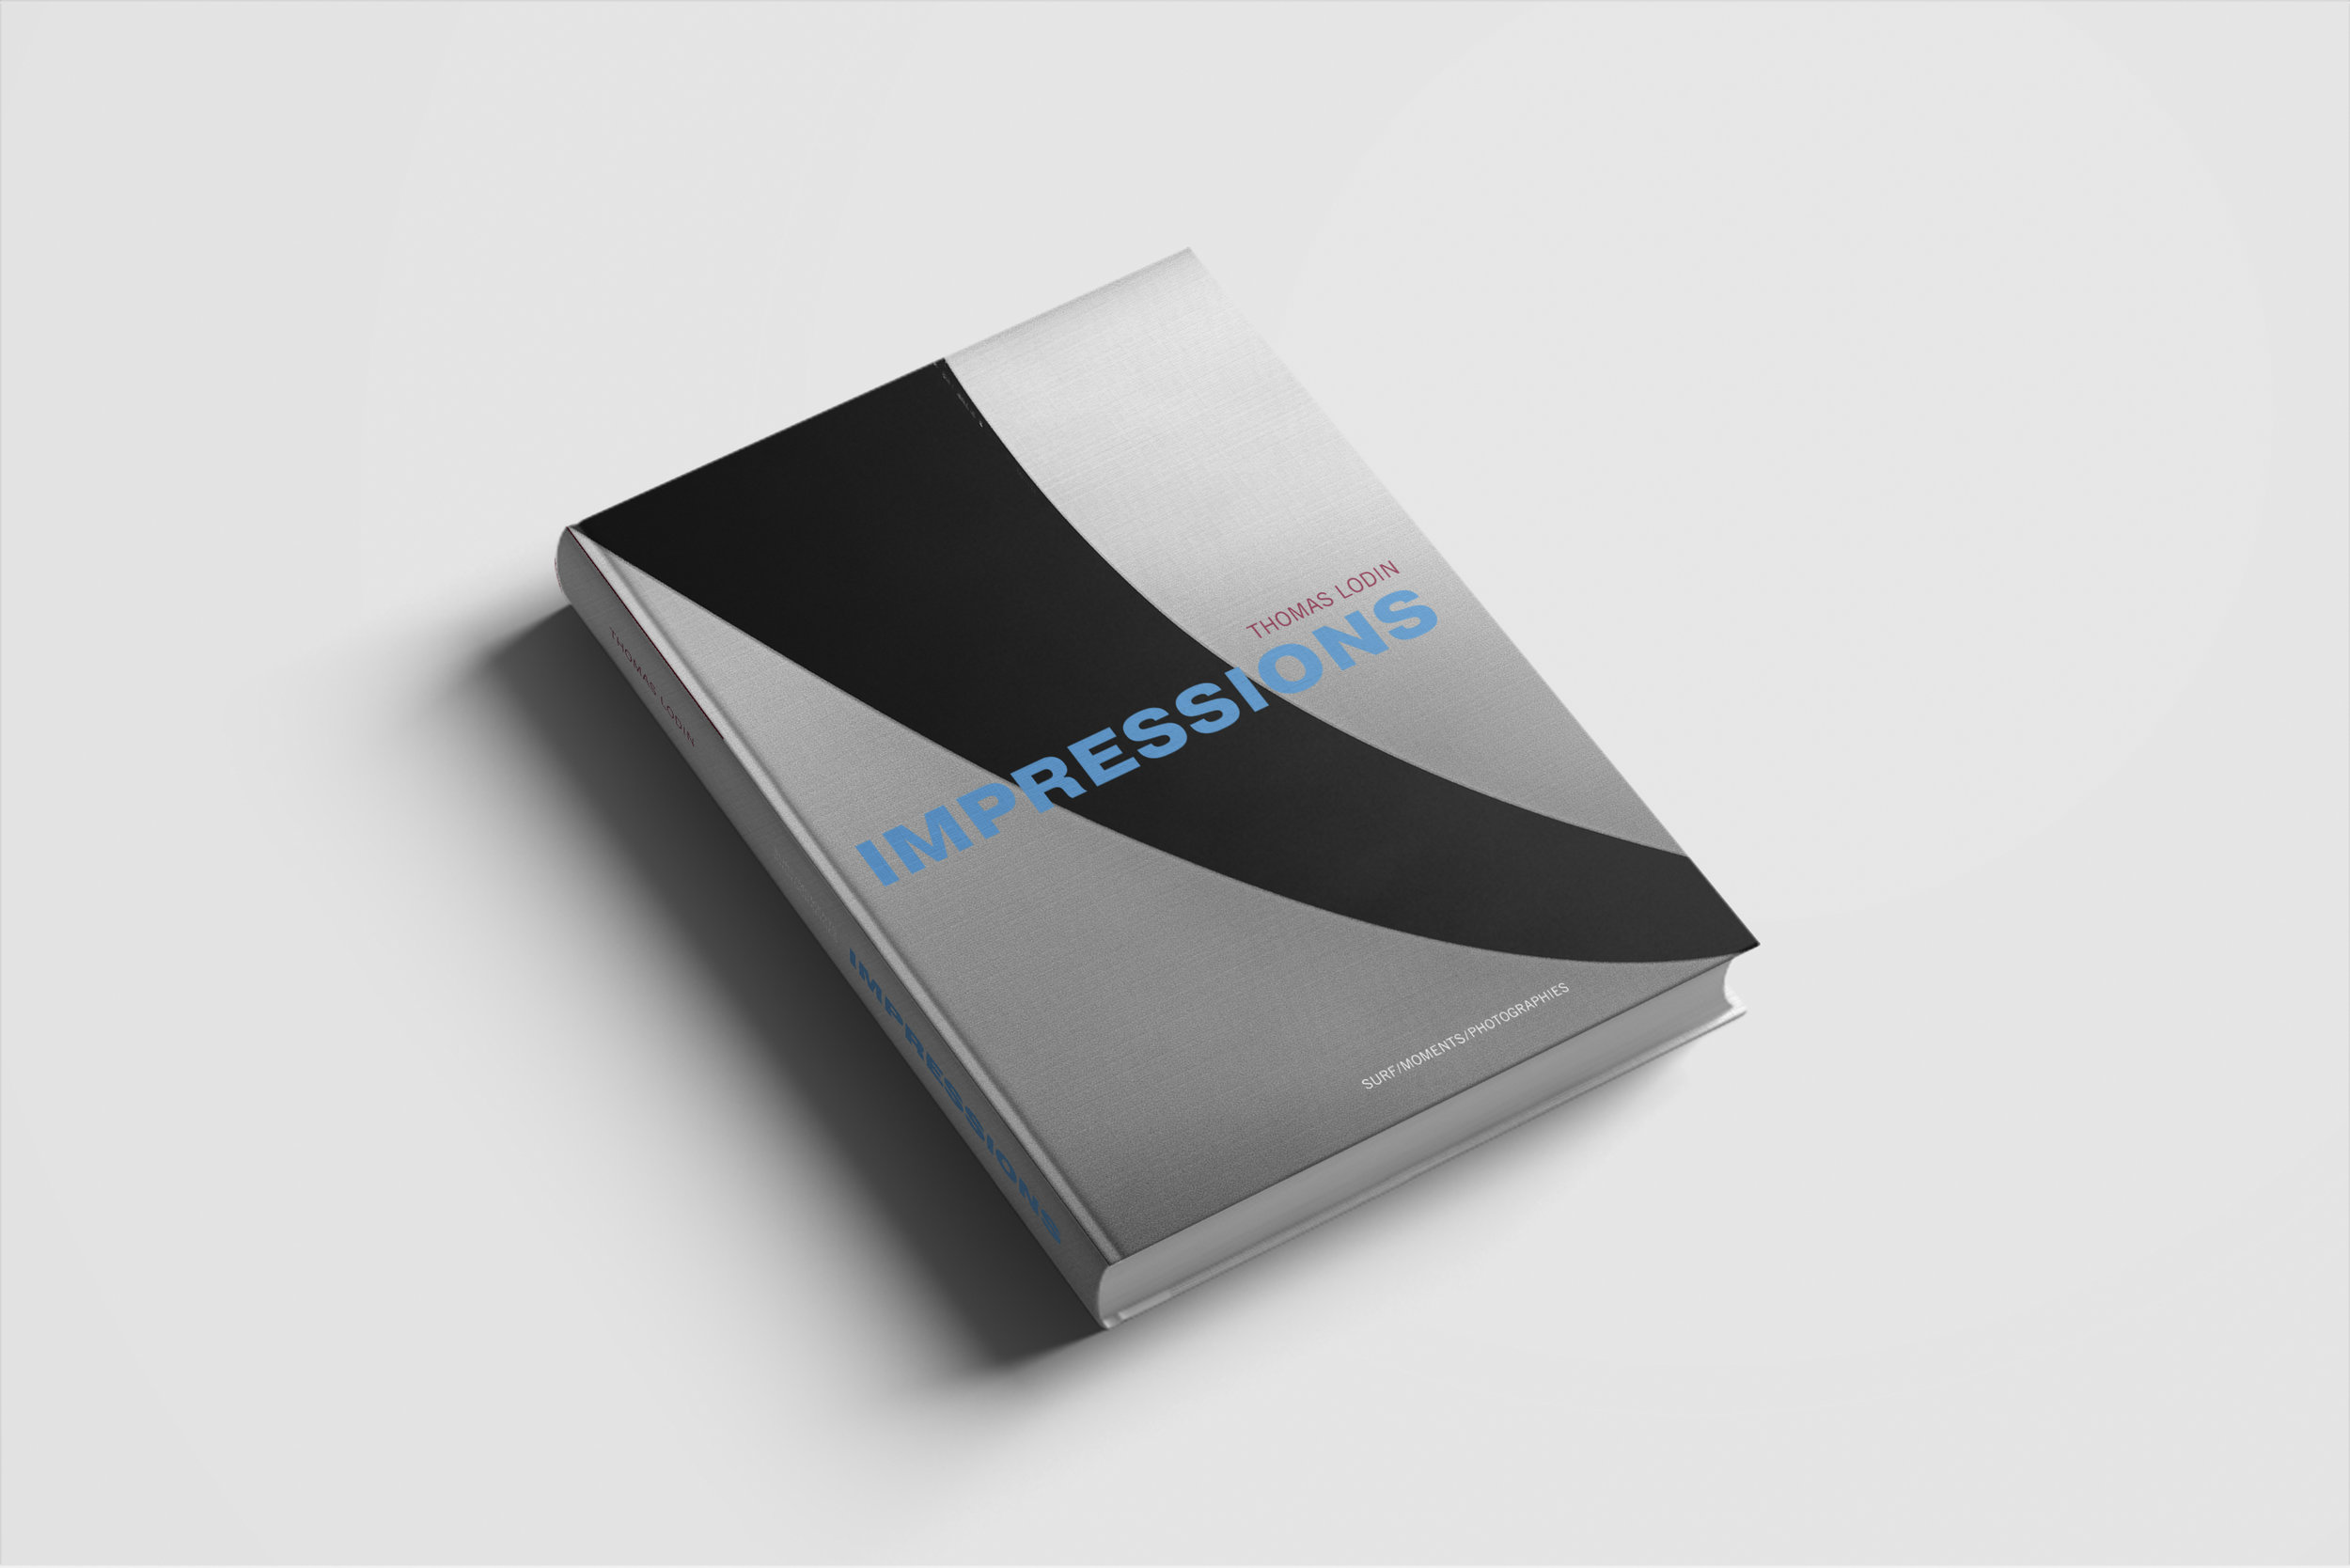 00-Couverture_Book-IMPRESSIONS_TLodin_vue1.jpg